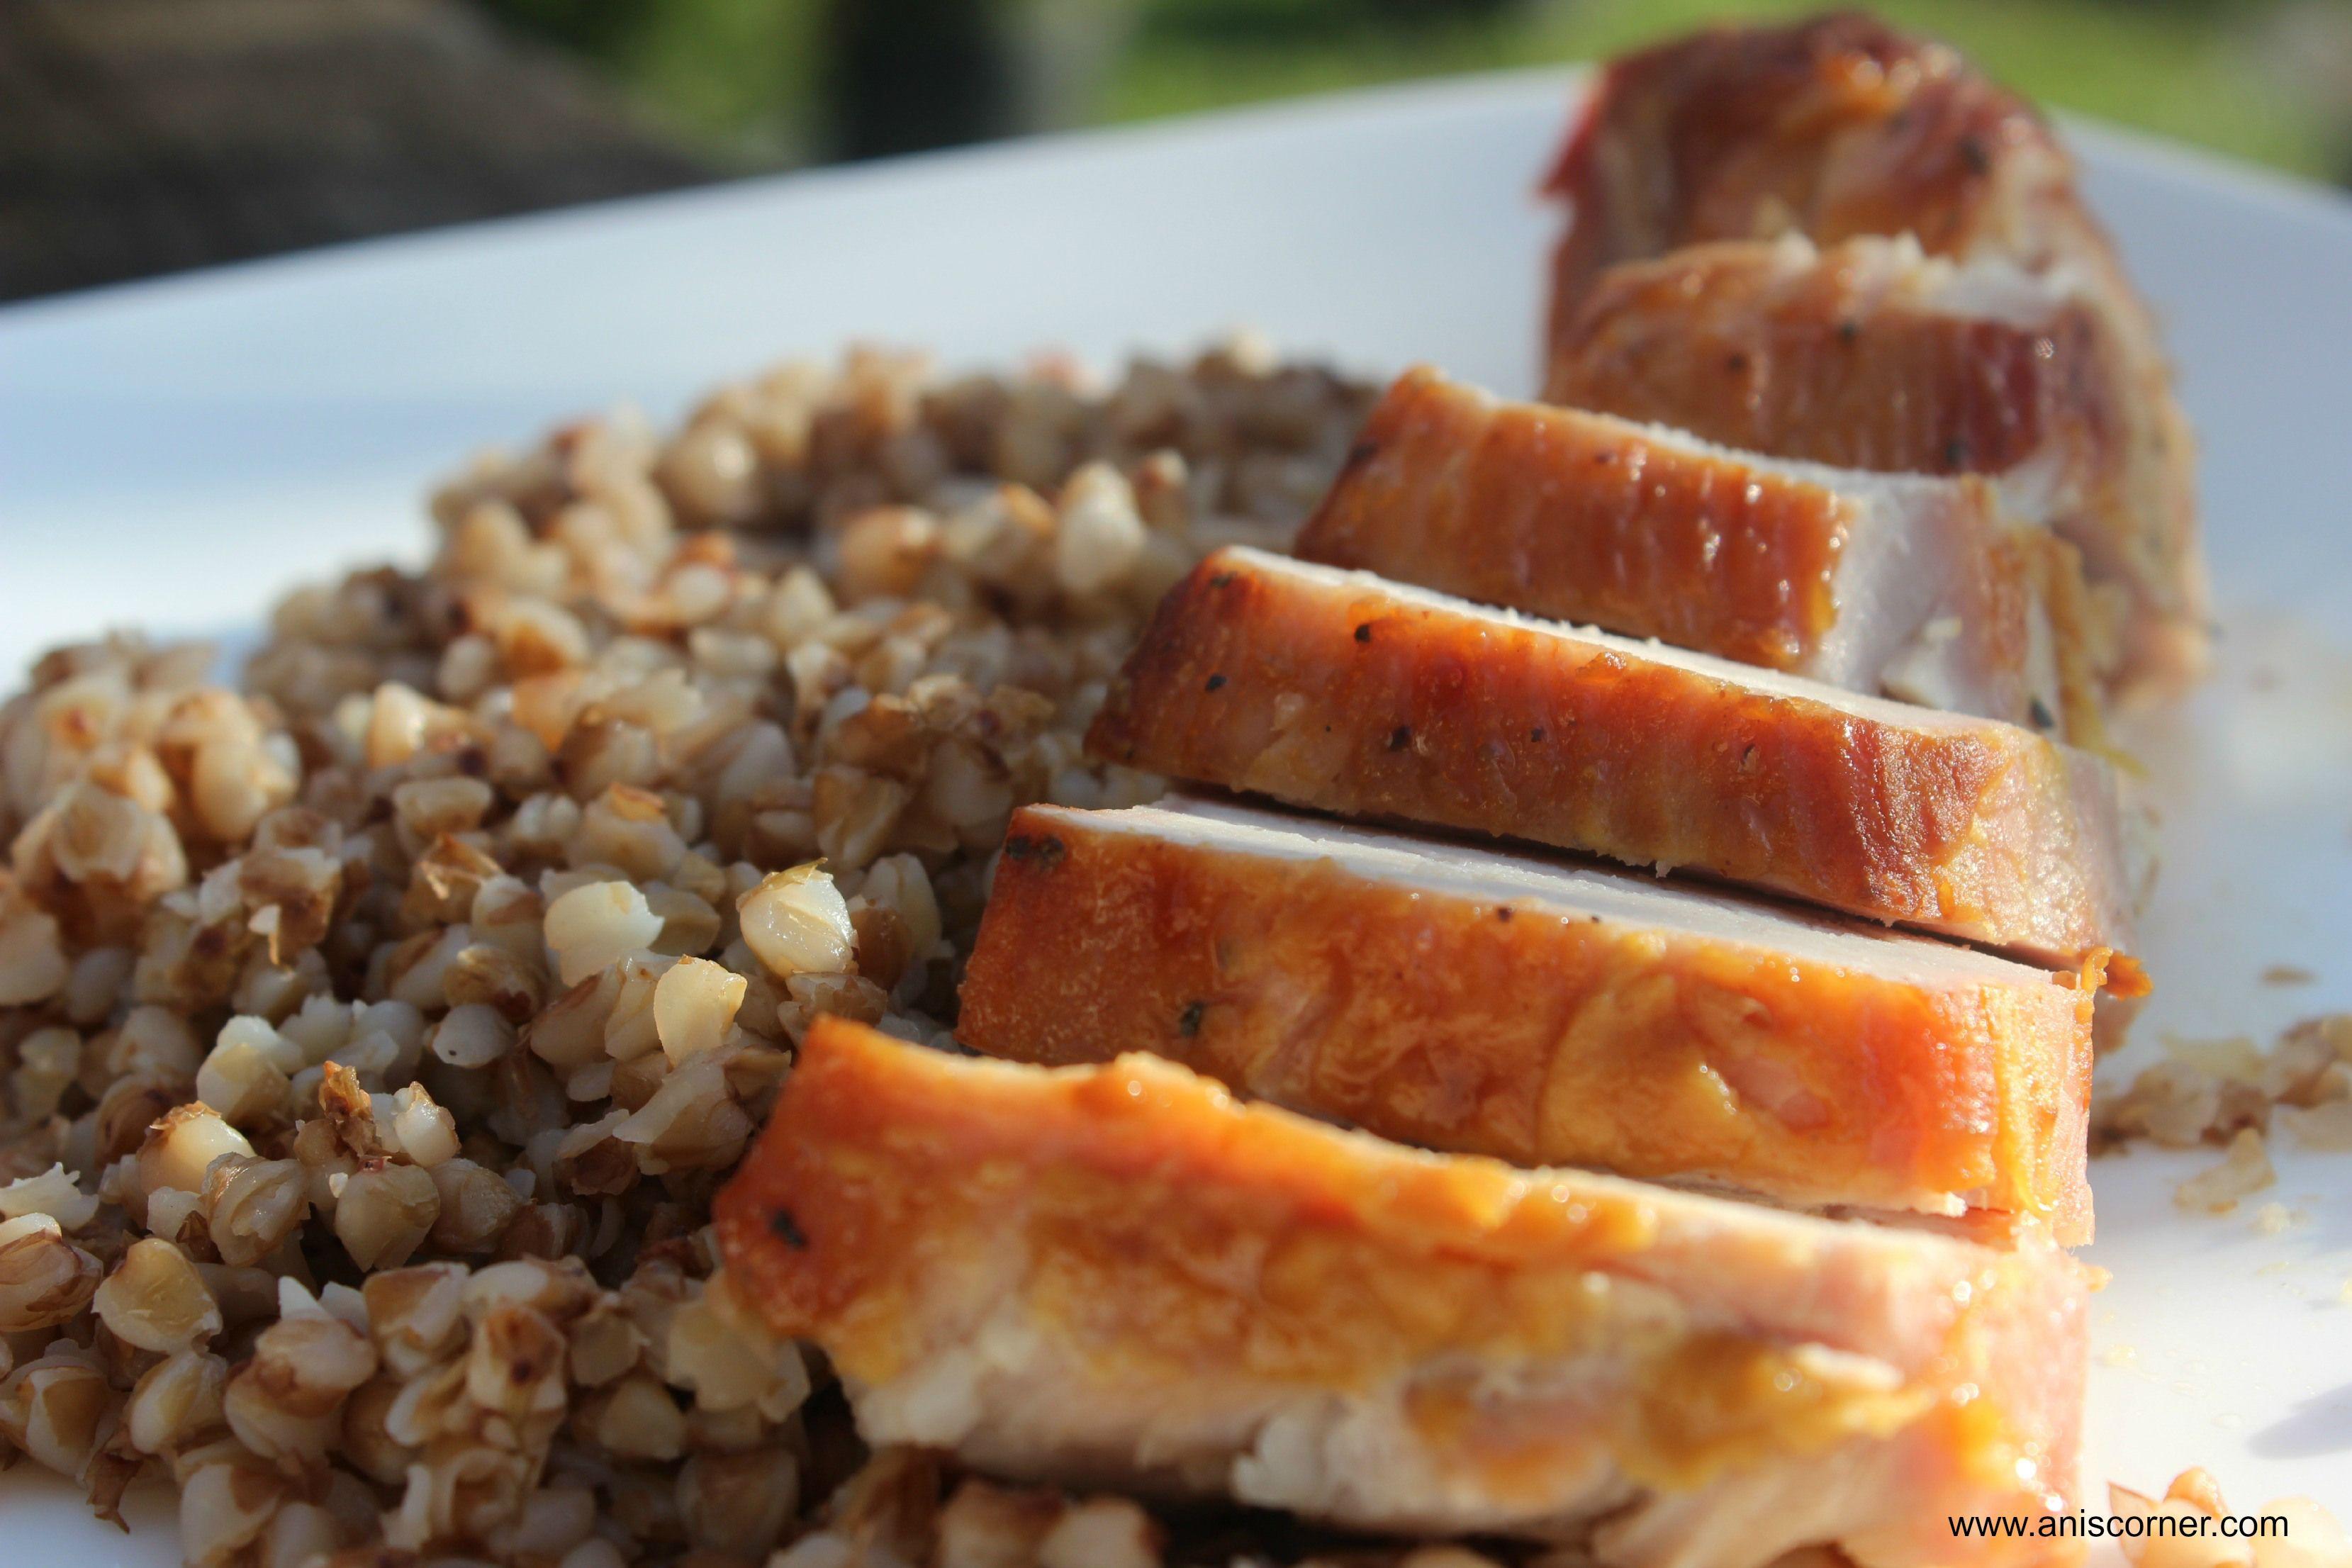 Mustard and Brown Sugar Glazed Pork Loin